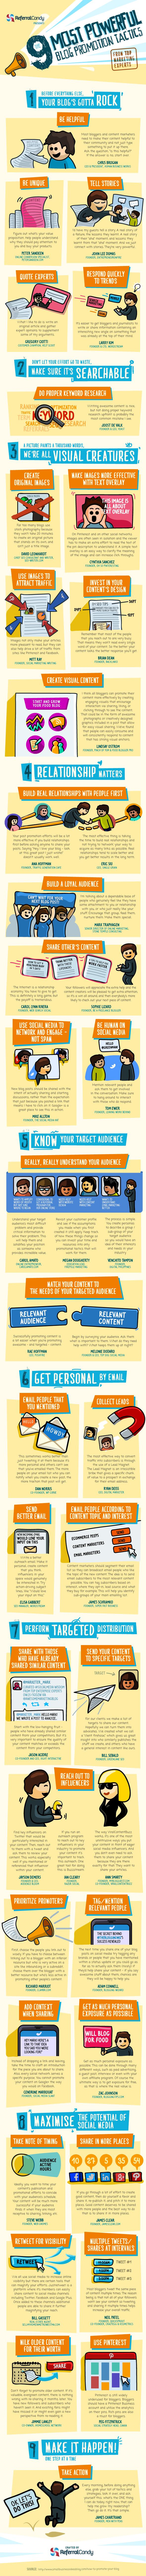 9 Blog Marketing Tactics [INFOGRAPHIC]